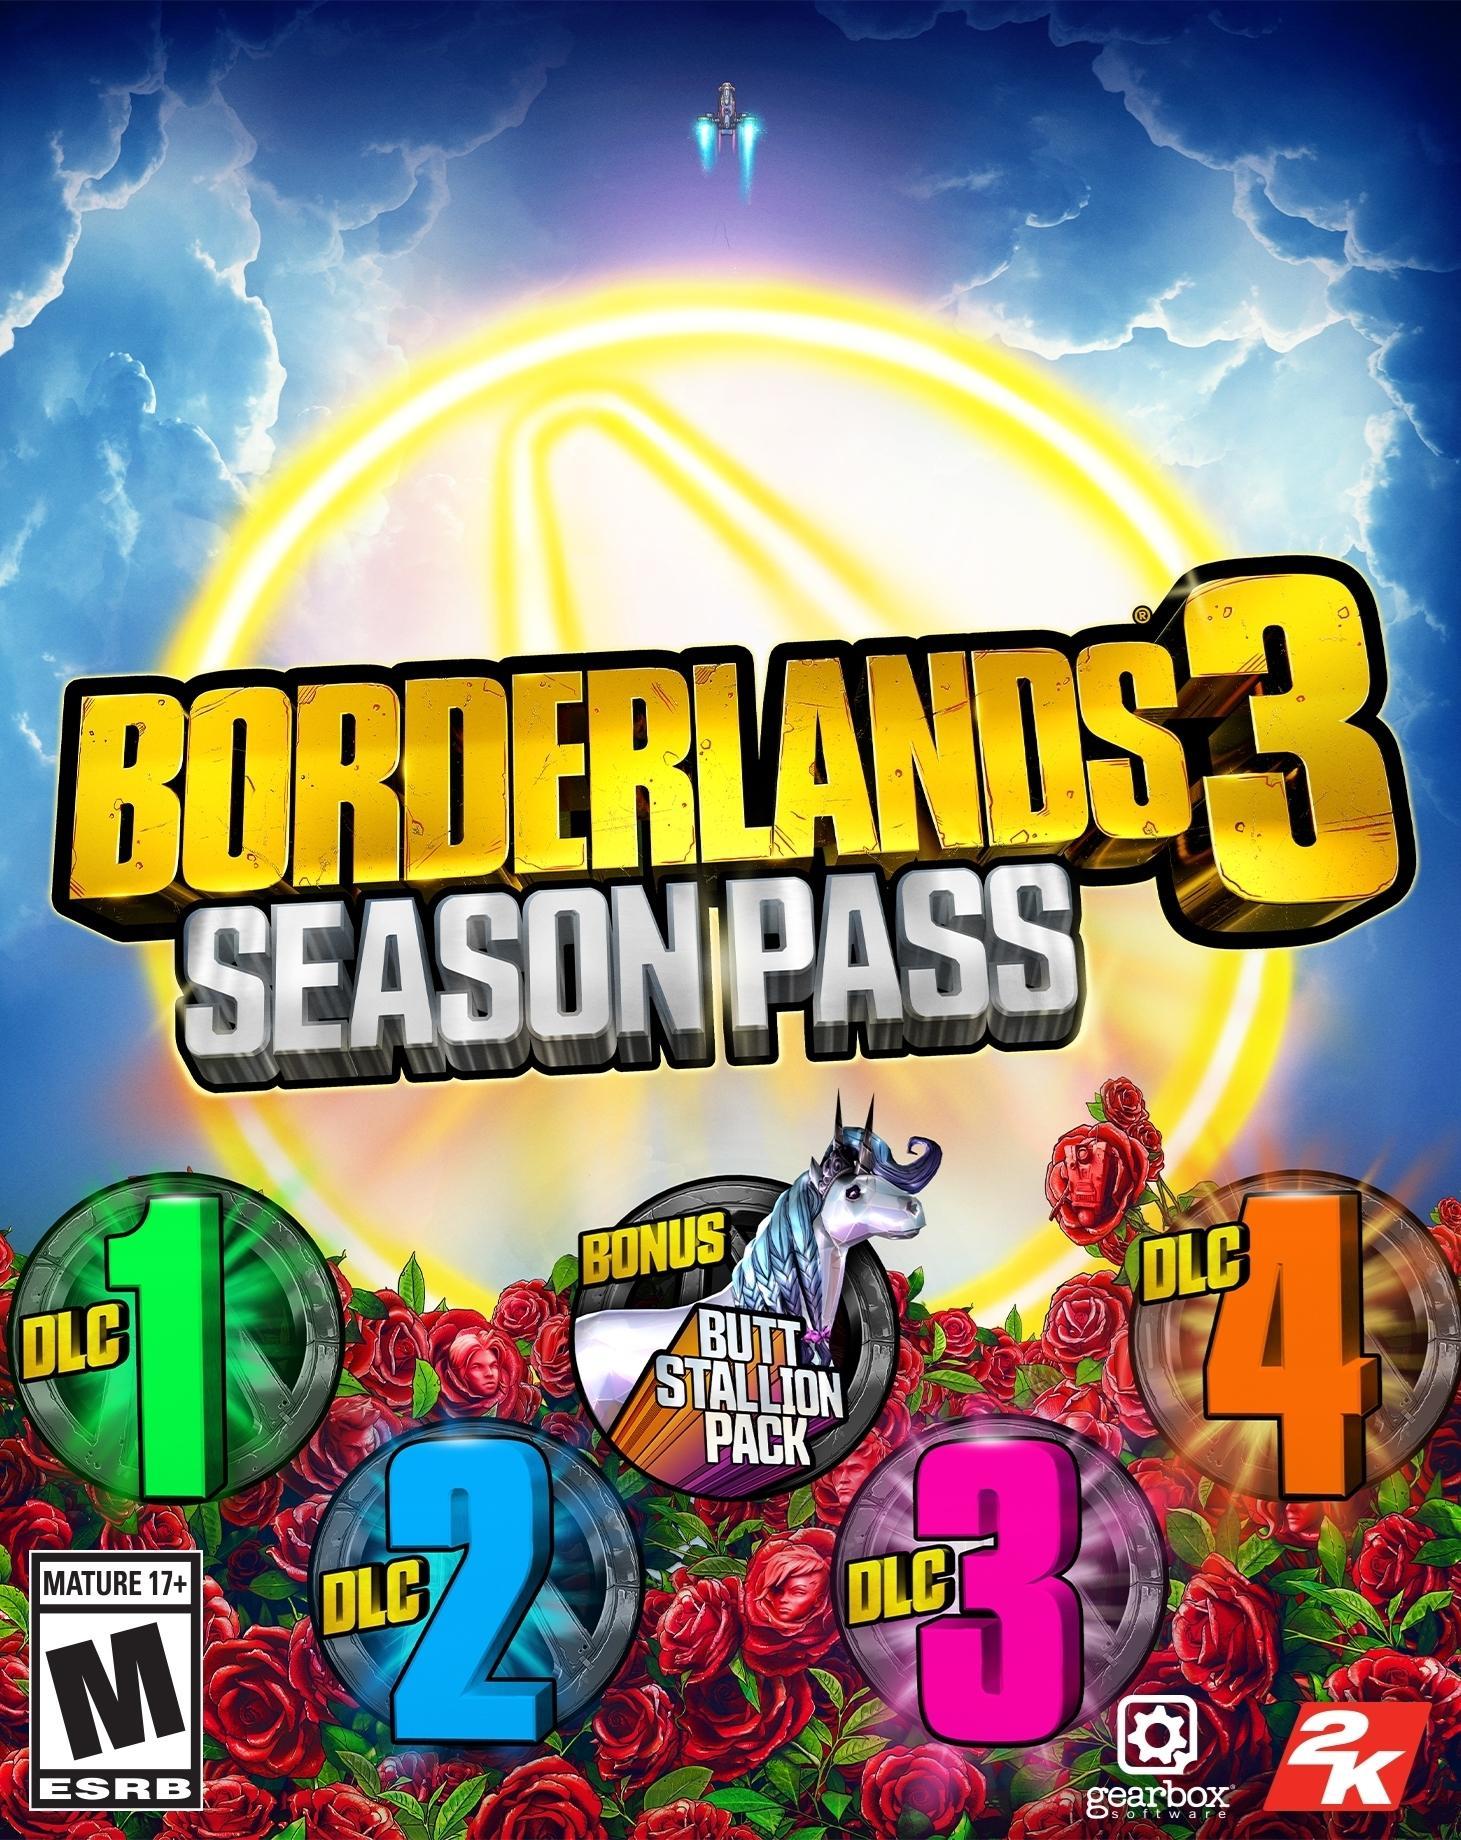 Borderlands 3 Season Pass (Steam) | ROW (ad540fdc-914c-4269-9ad6-c25b9cc1906d)